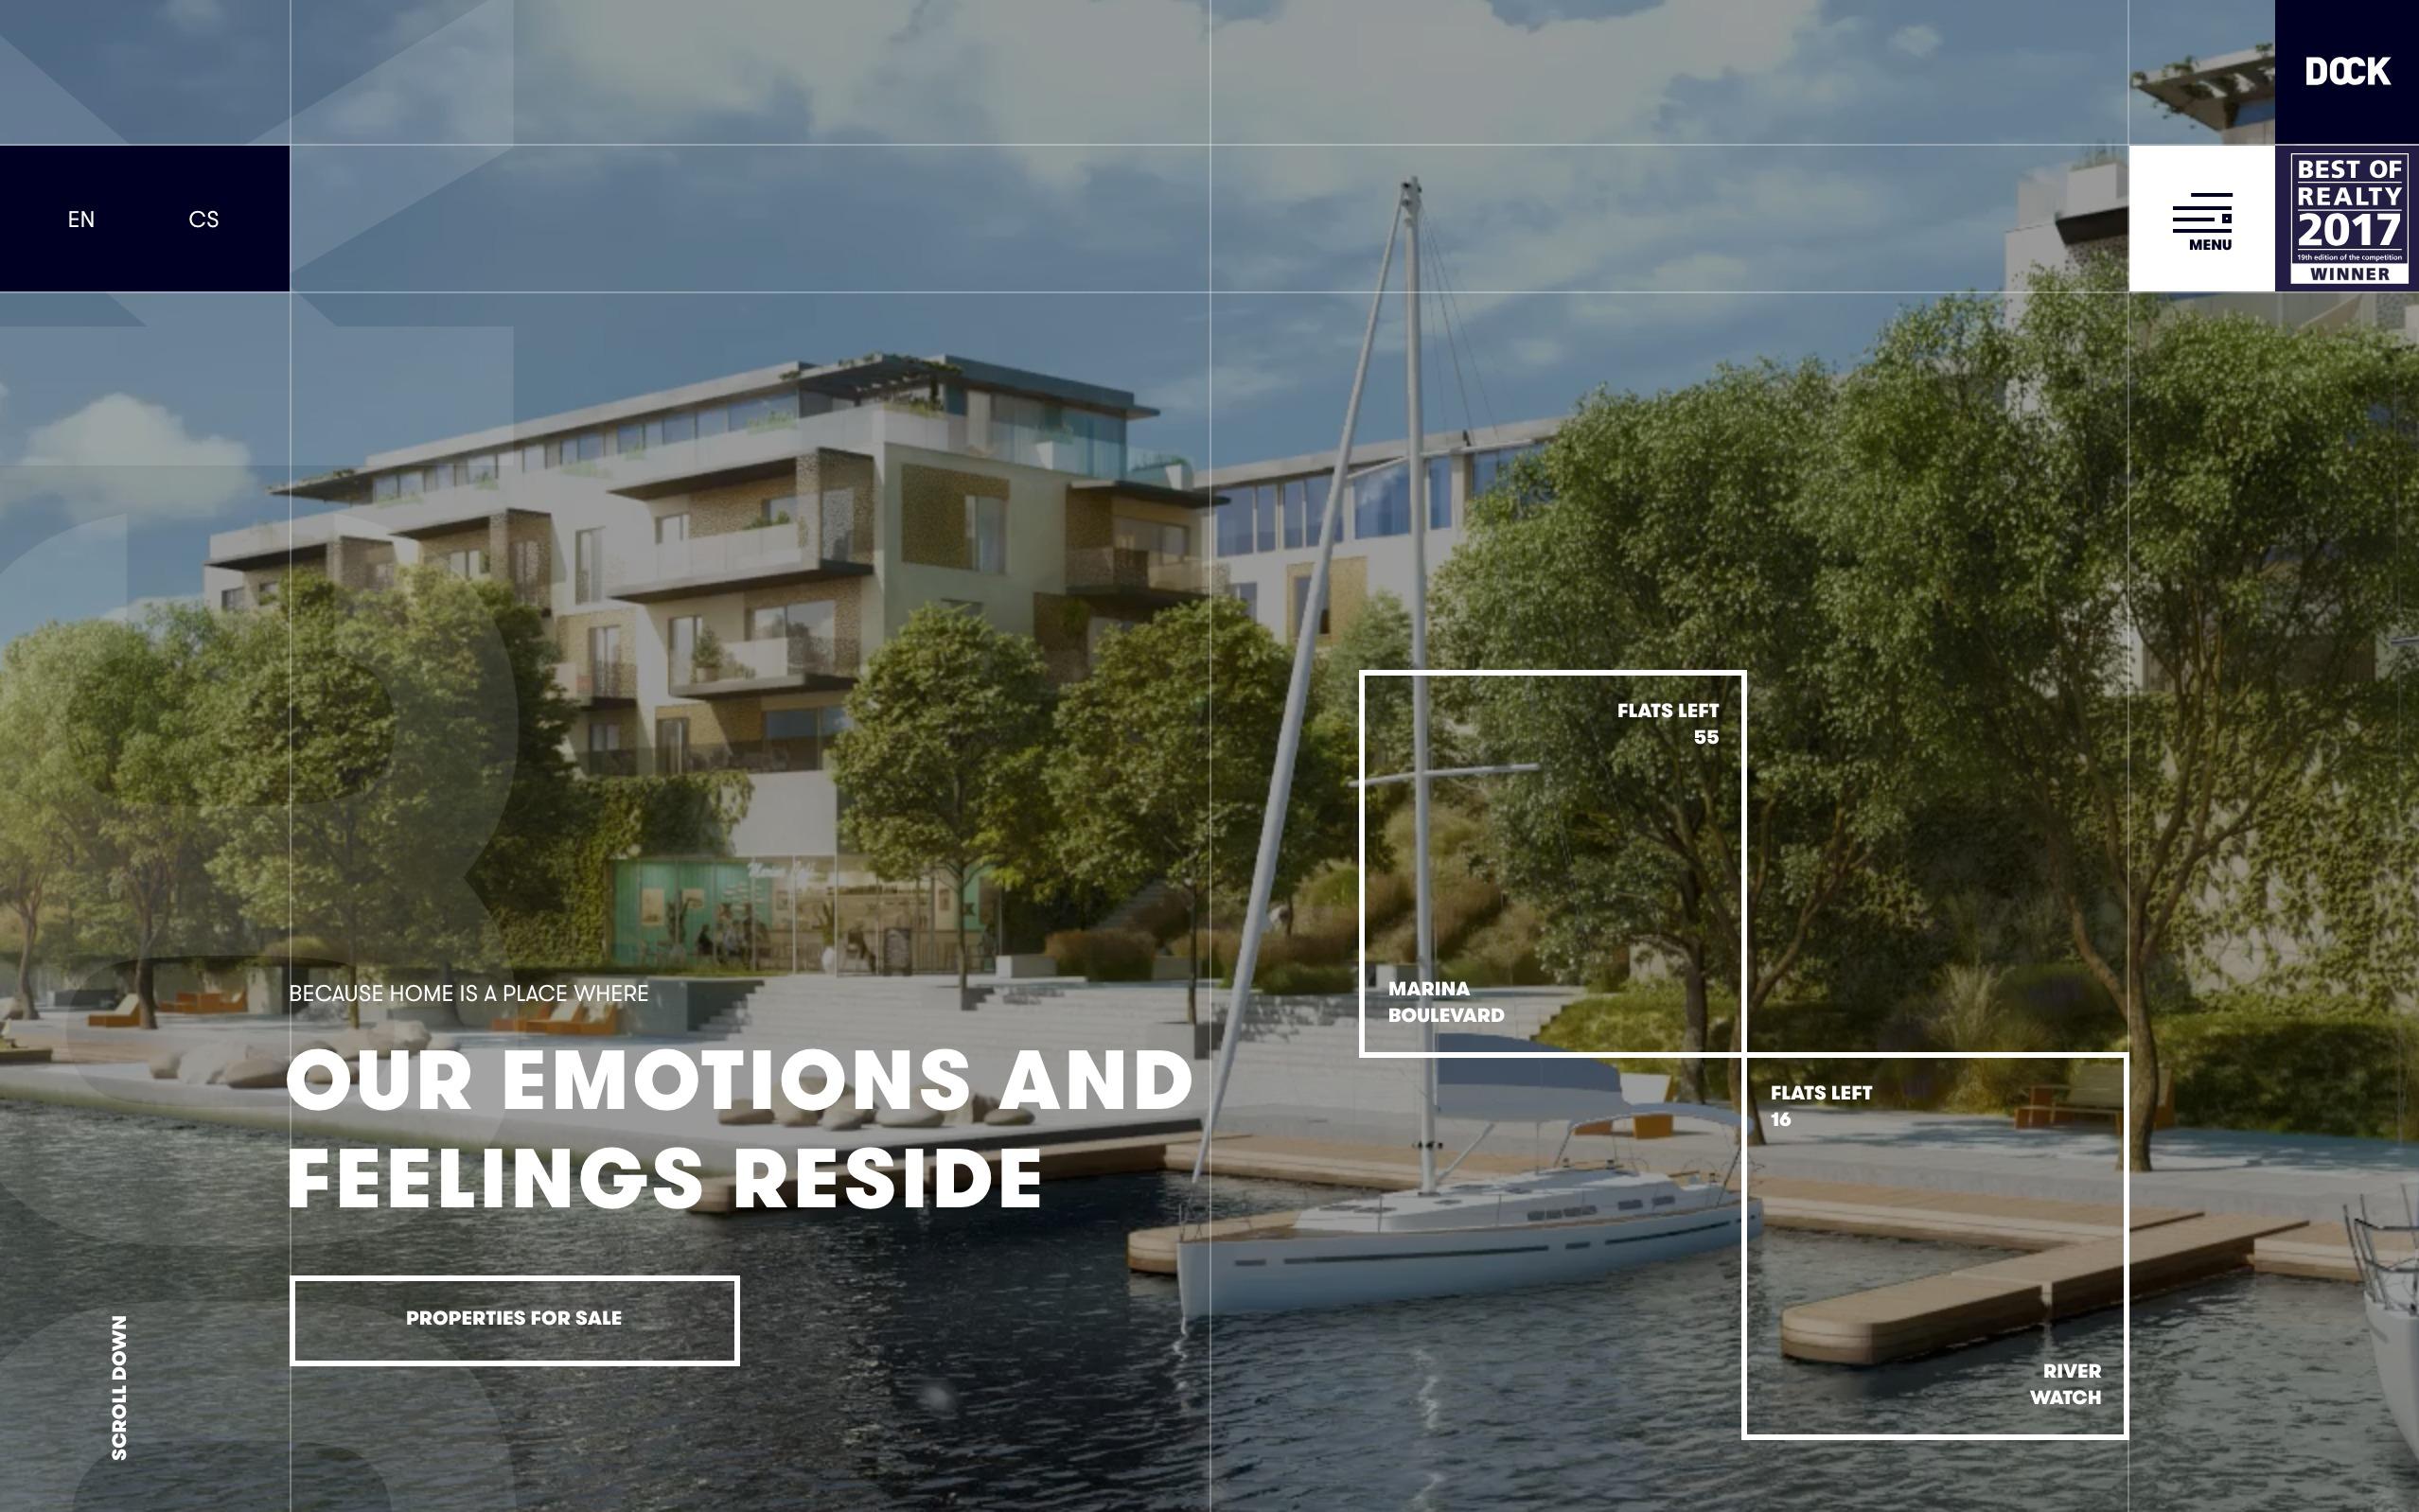 best architecture firm websites. Dock